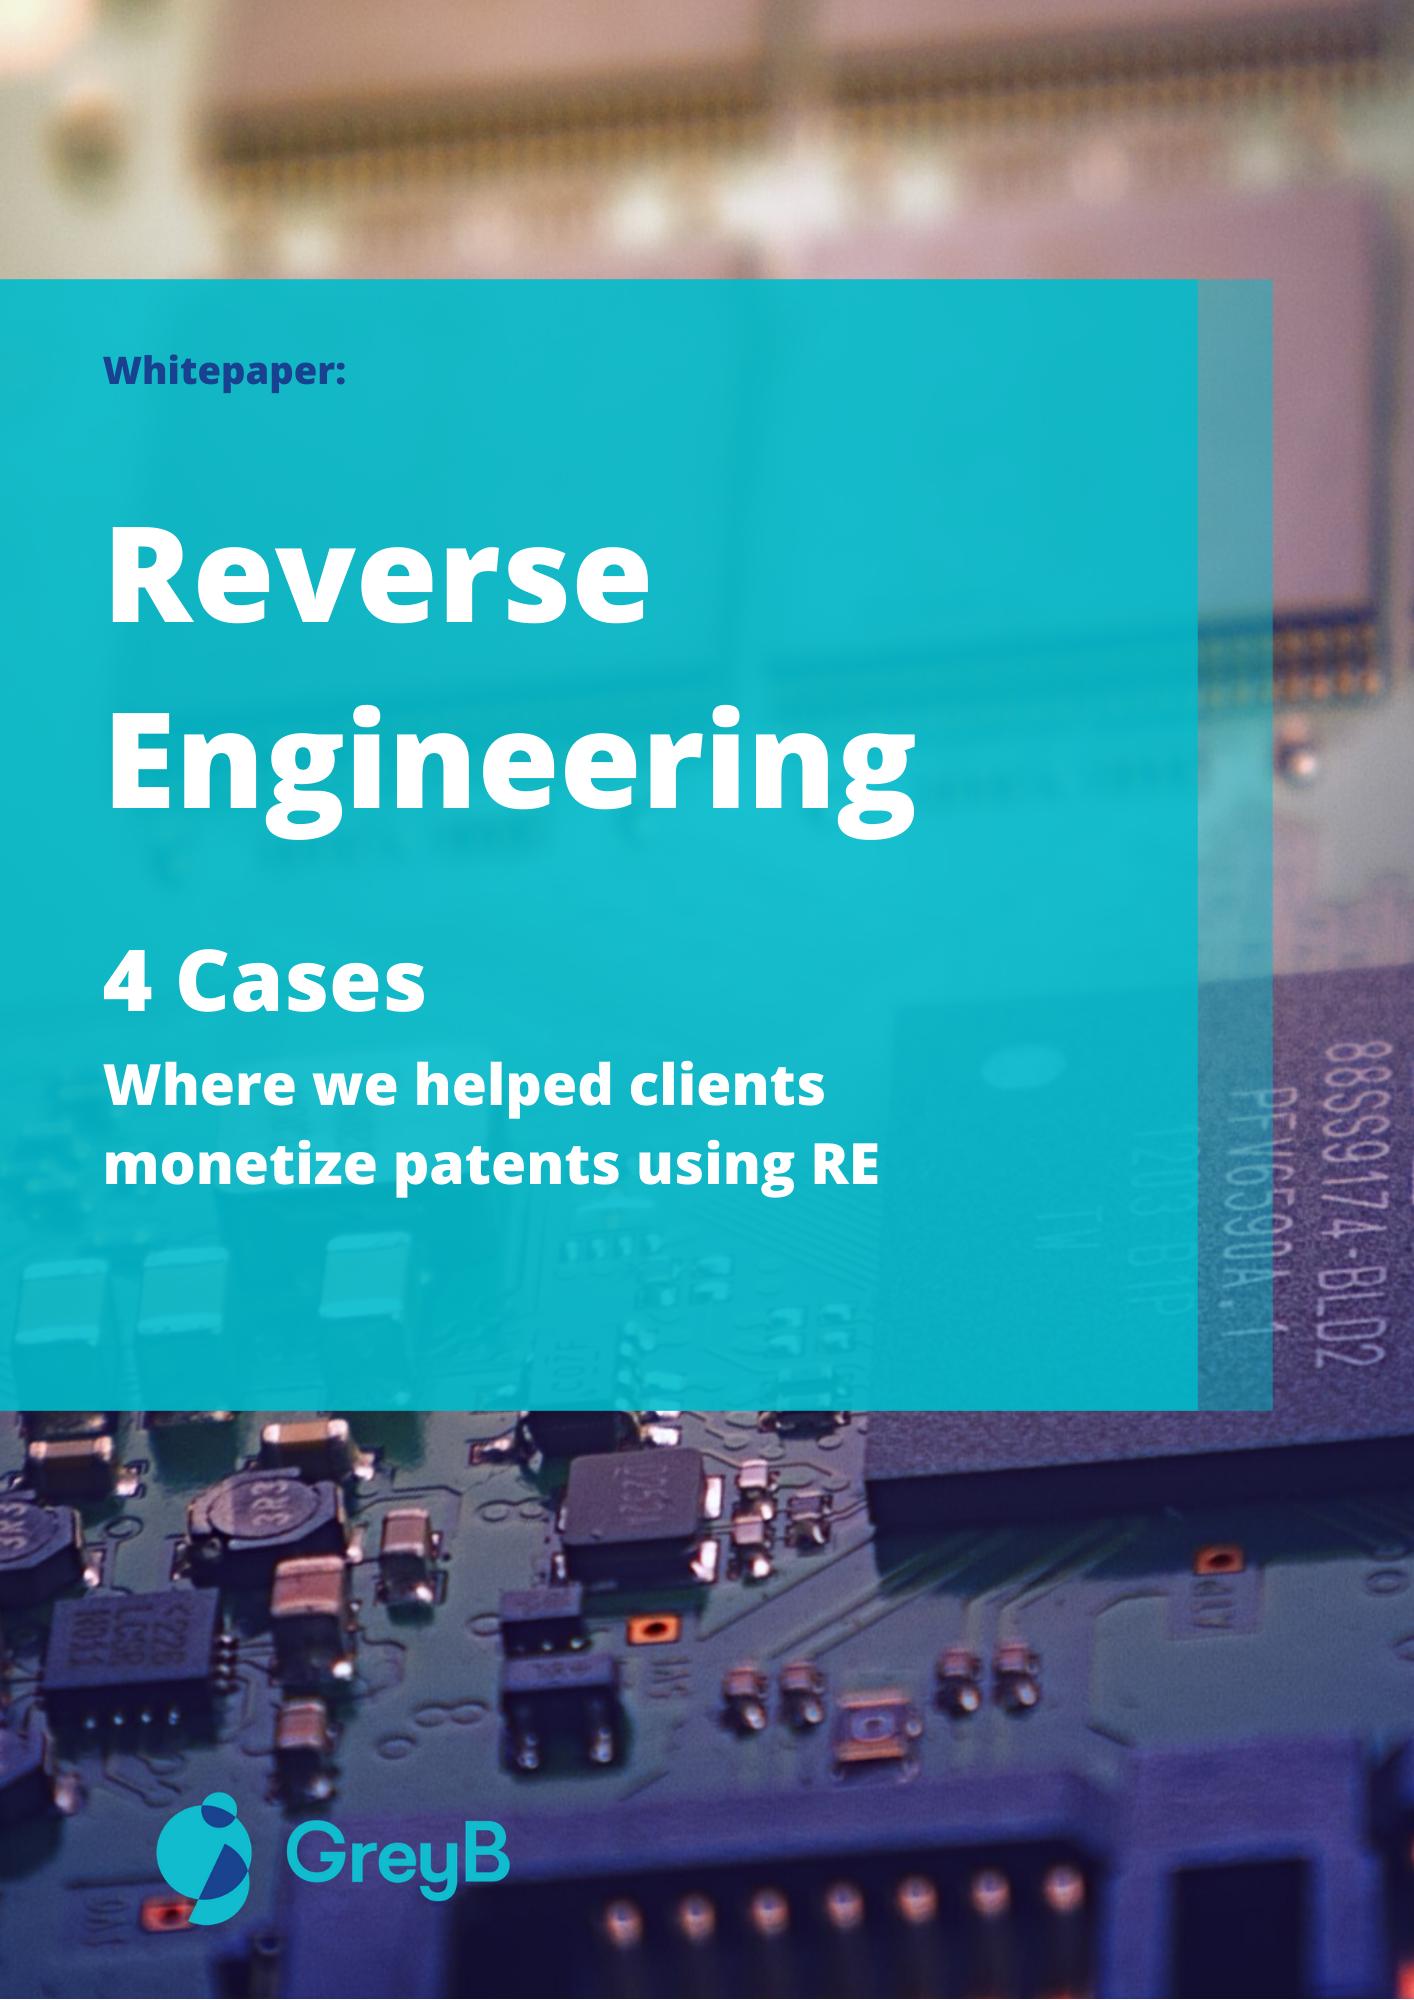 Whitepaper - Reverse engineering patent infringement case study